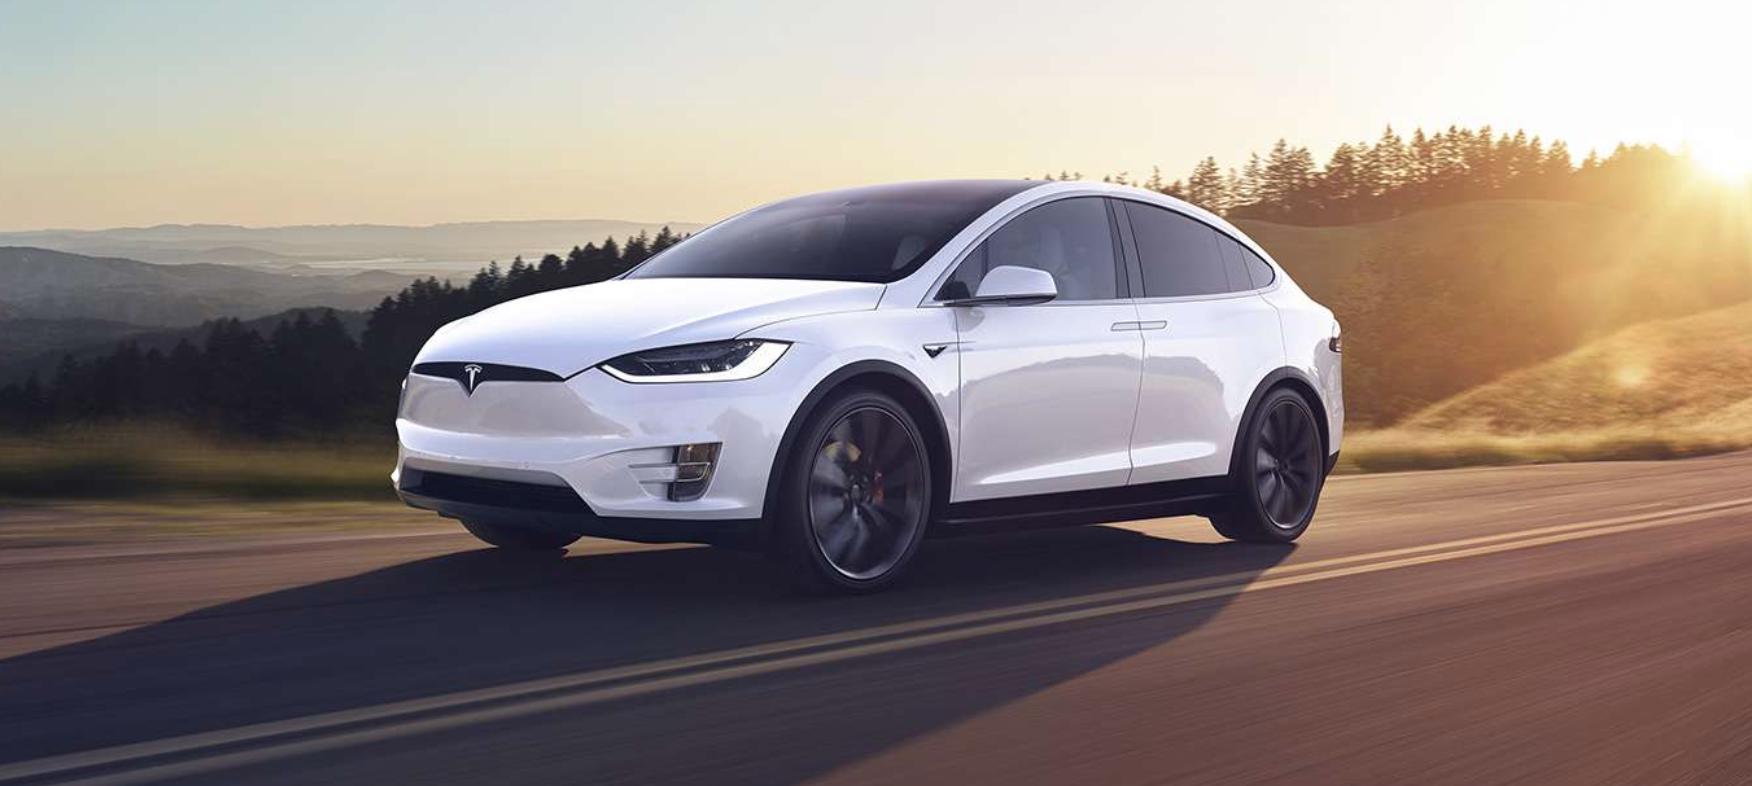 Tesla says fatal crash involved Autopilot | TechCrunch